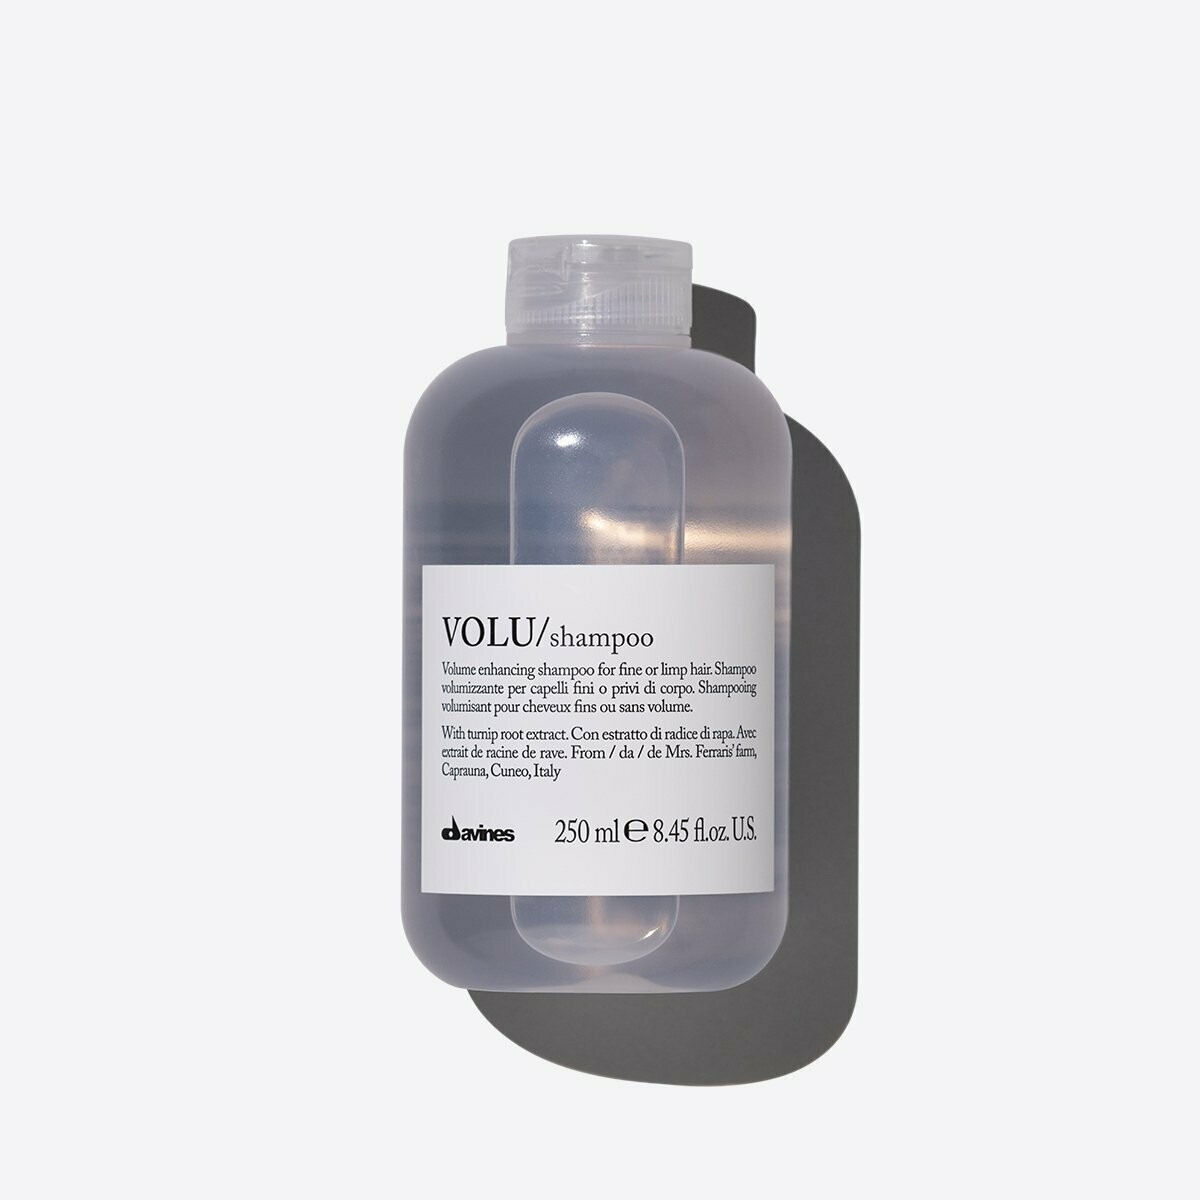 VOLU Shampoo 250 ml